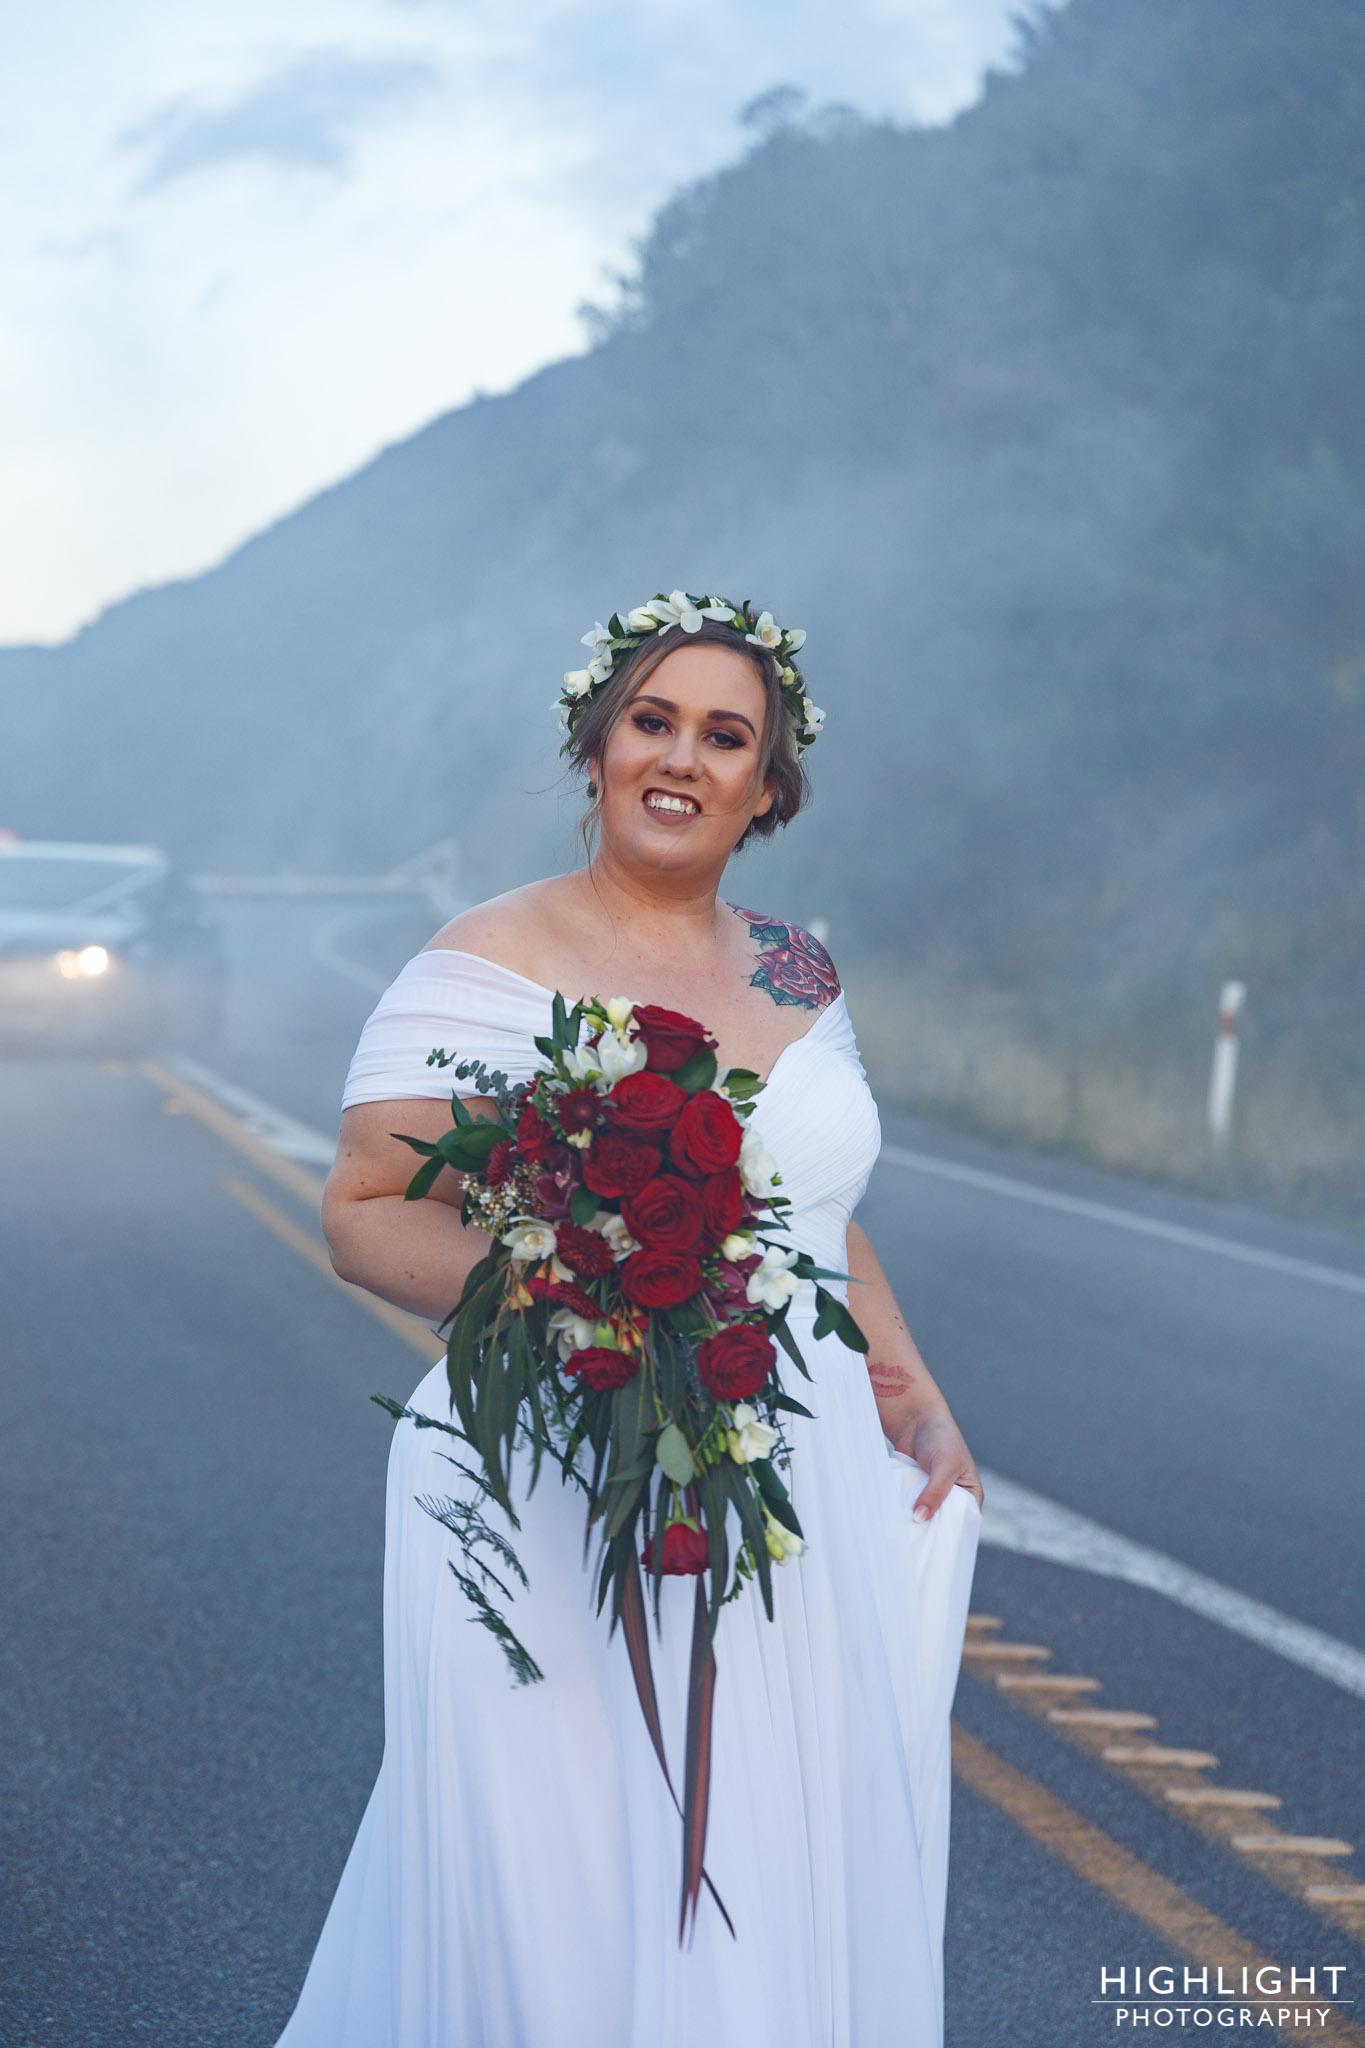 Highlight-wedding-photography-new-zealand-palmerston-north-100.jpg